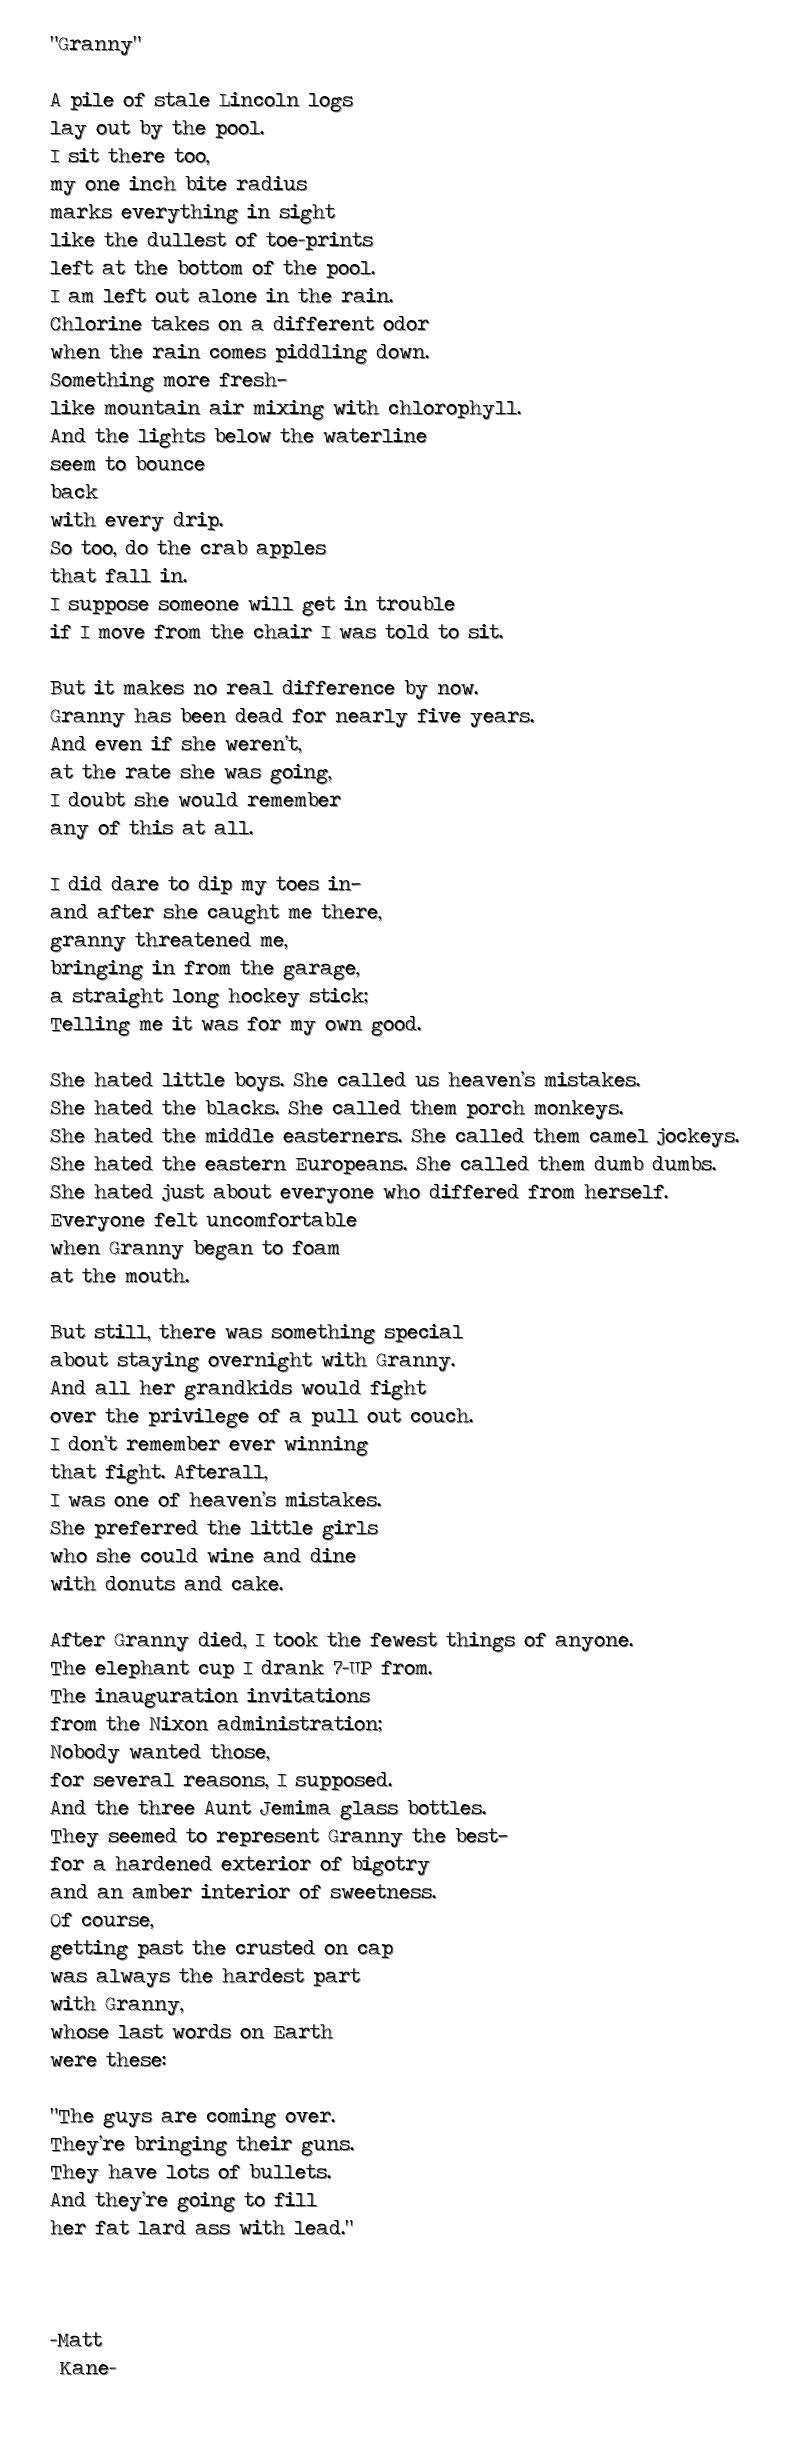 Granny - a poem by Matt Kane